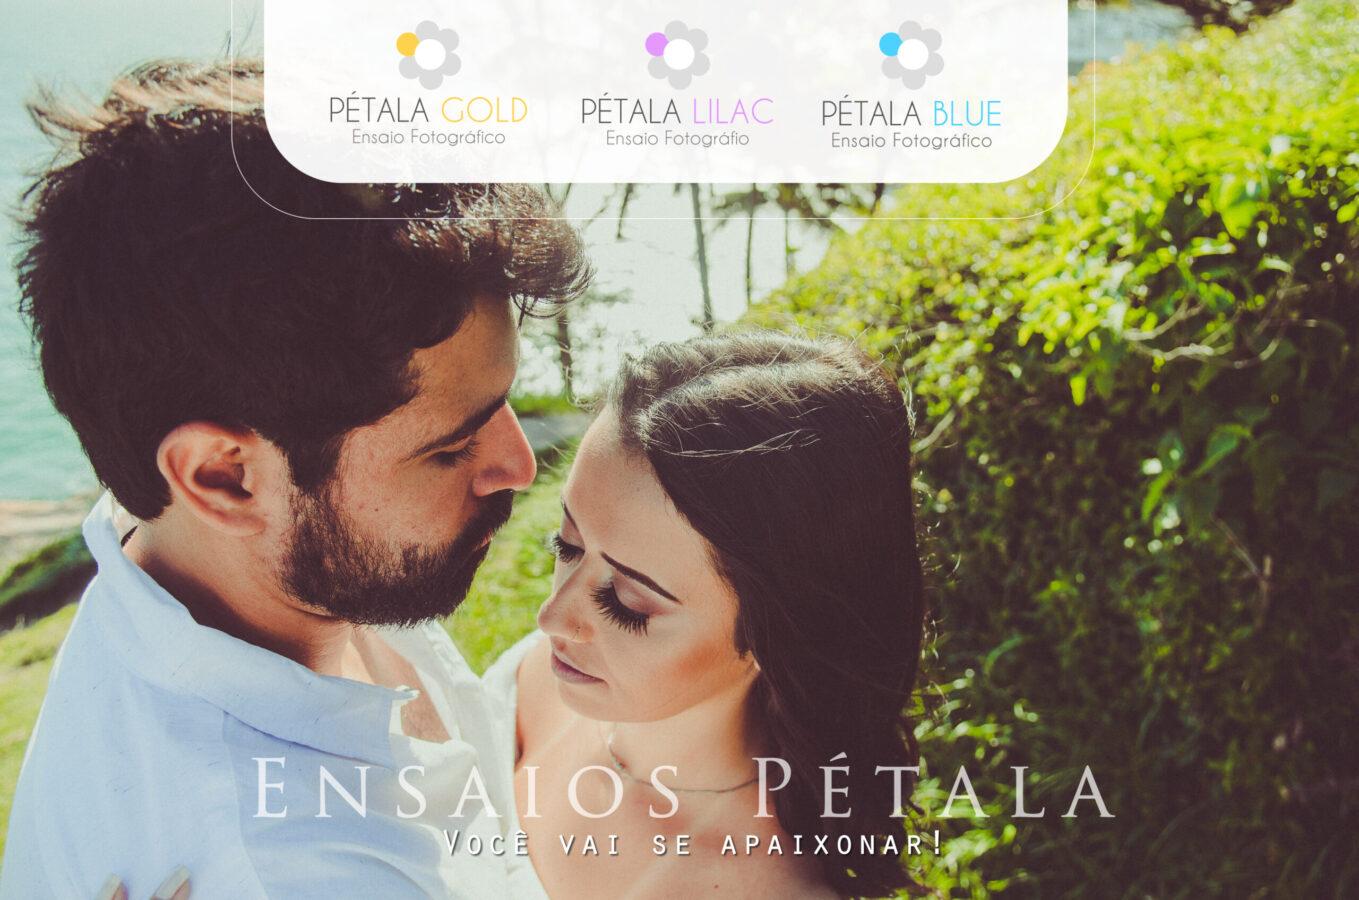 fotos página inicial casal_a